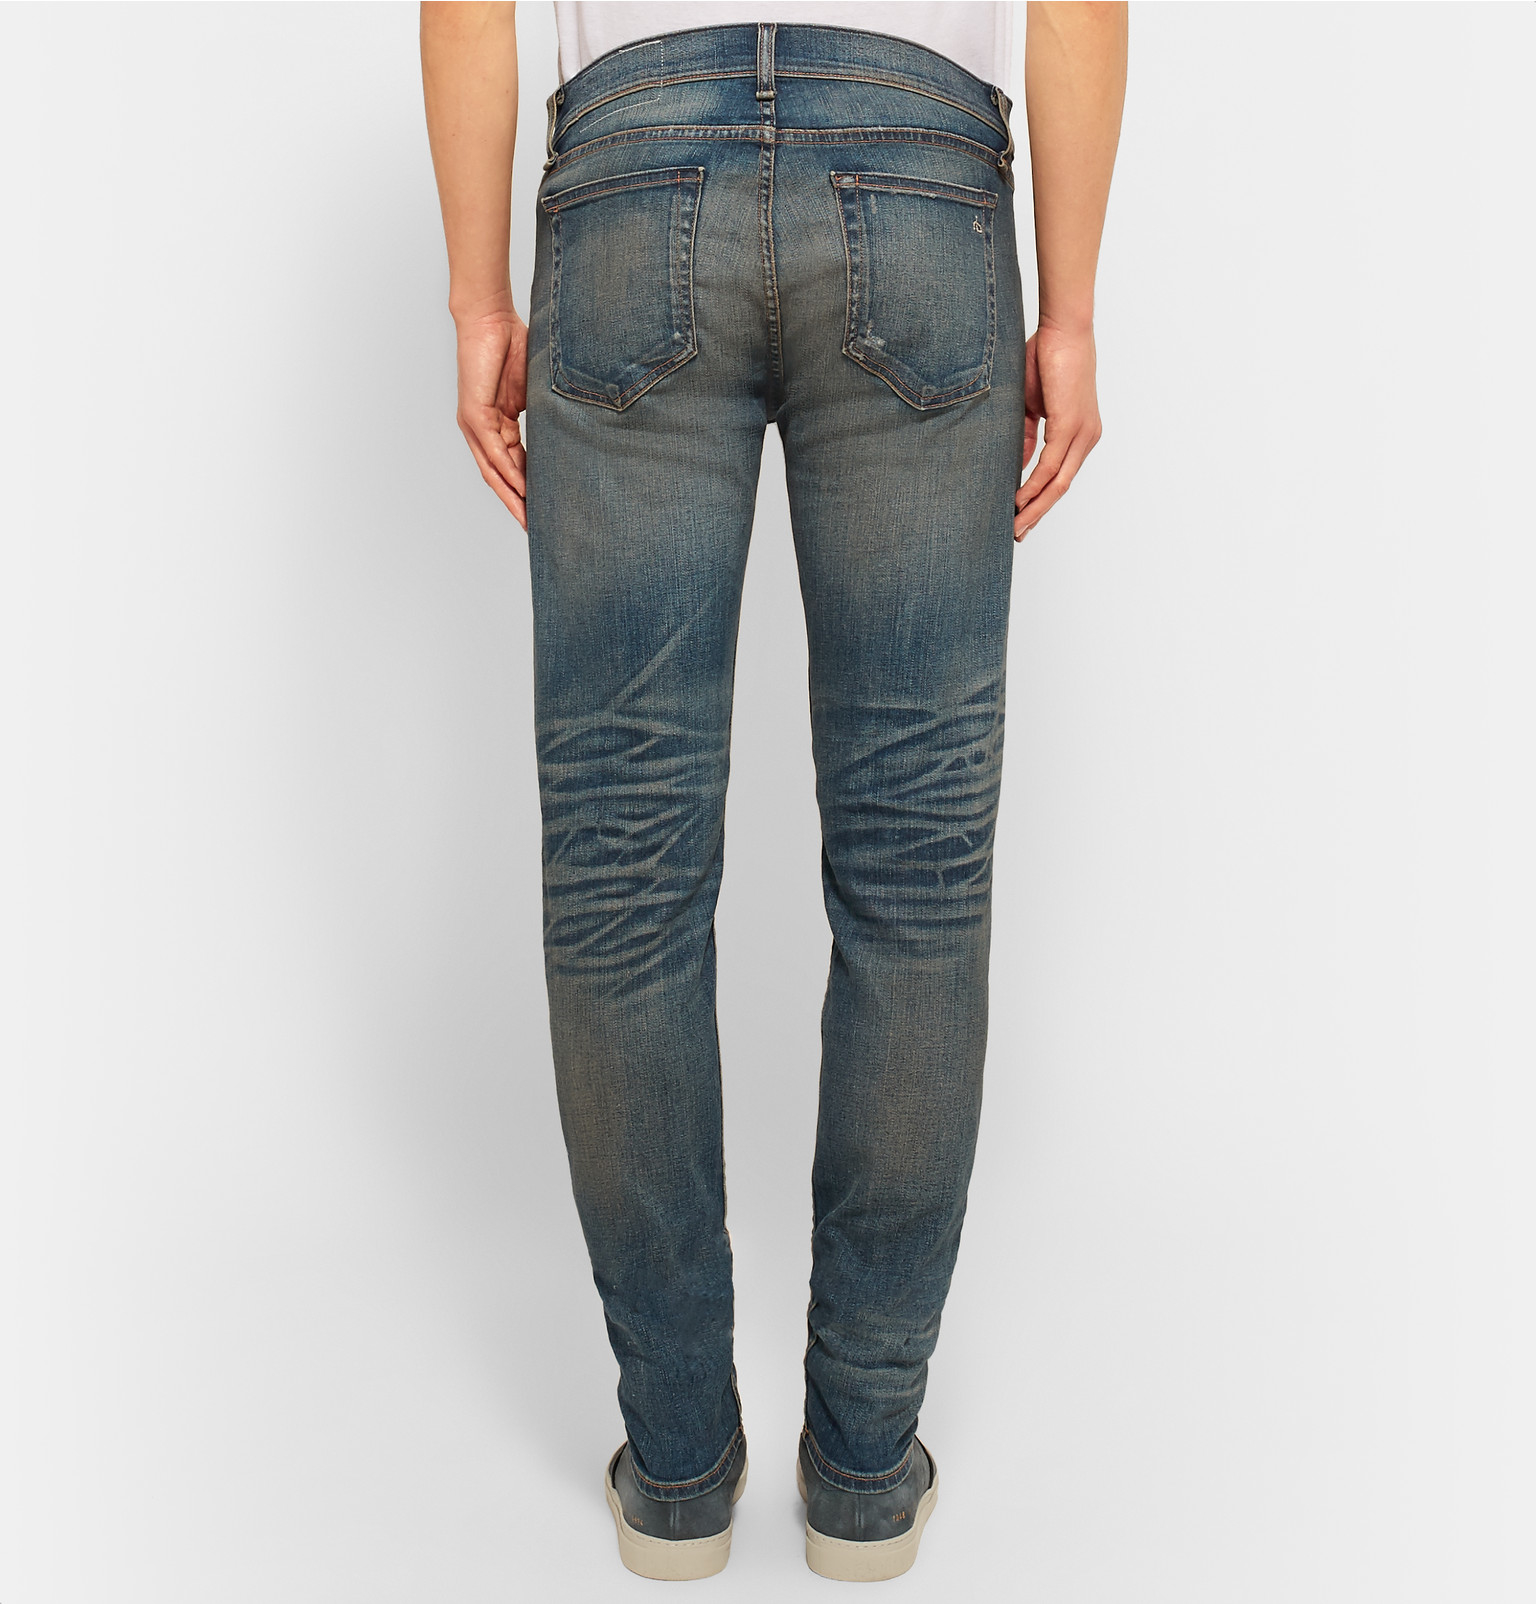 Adapter Une Maigre Ajustement Des Jeans En Denim Stretch Rag & Bone tIRtYP